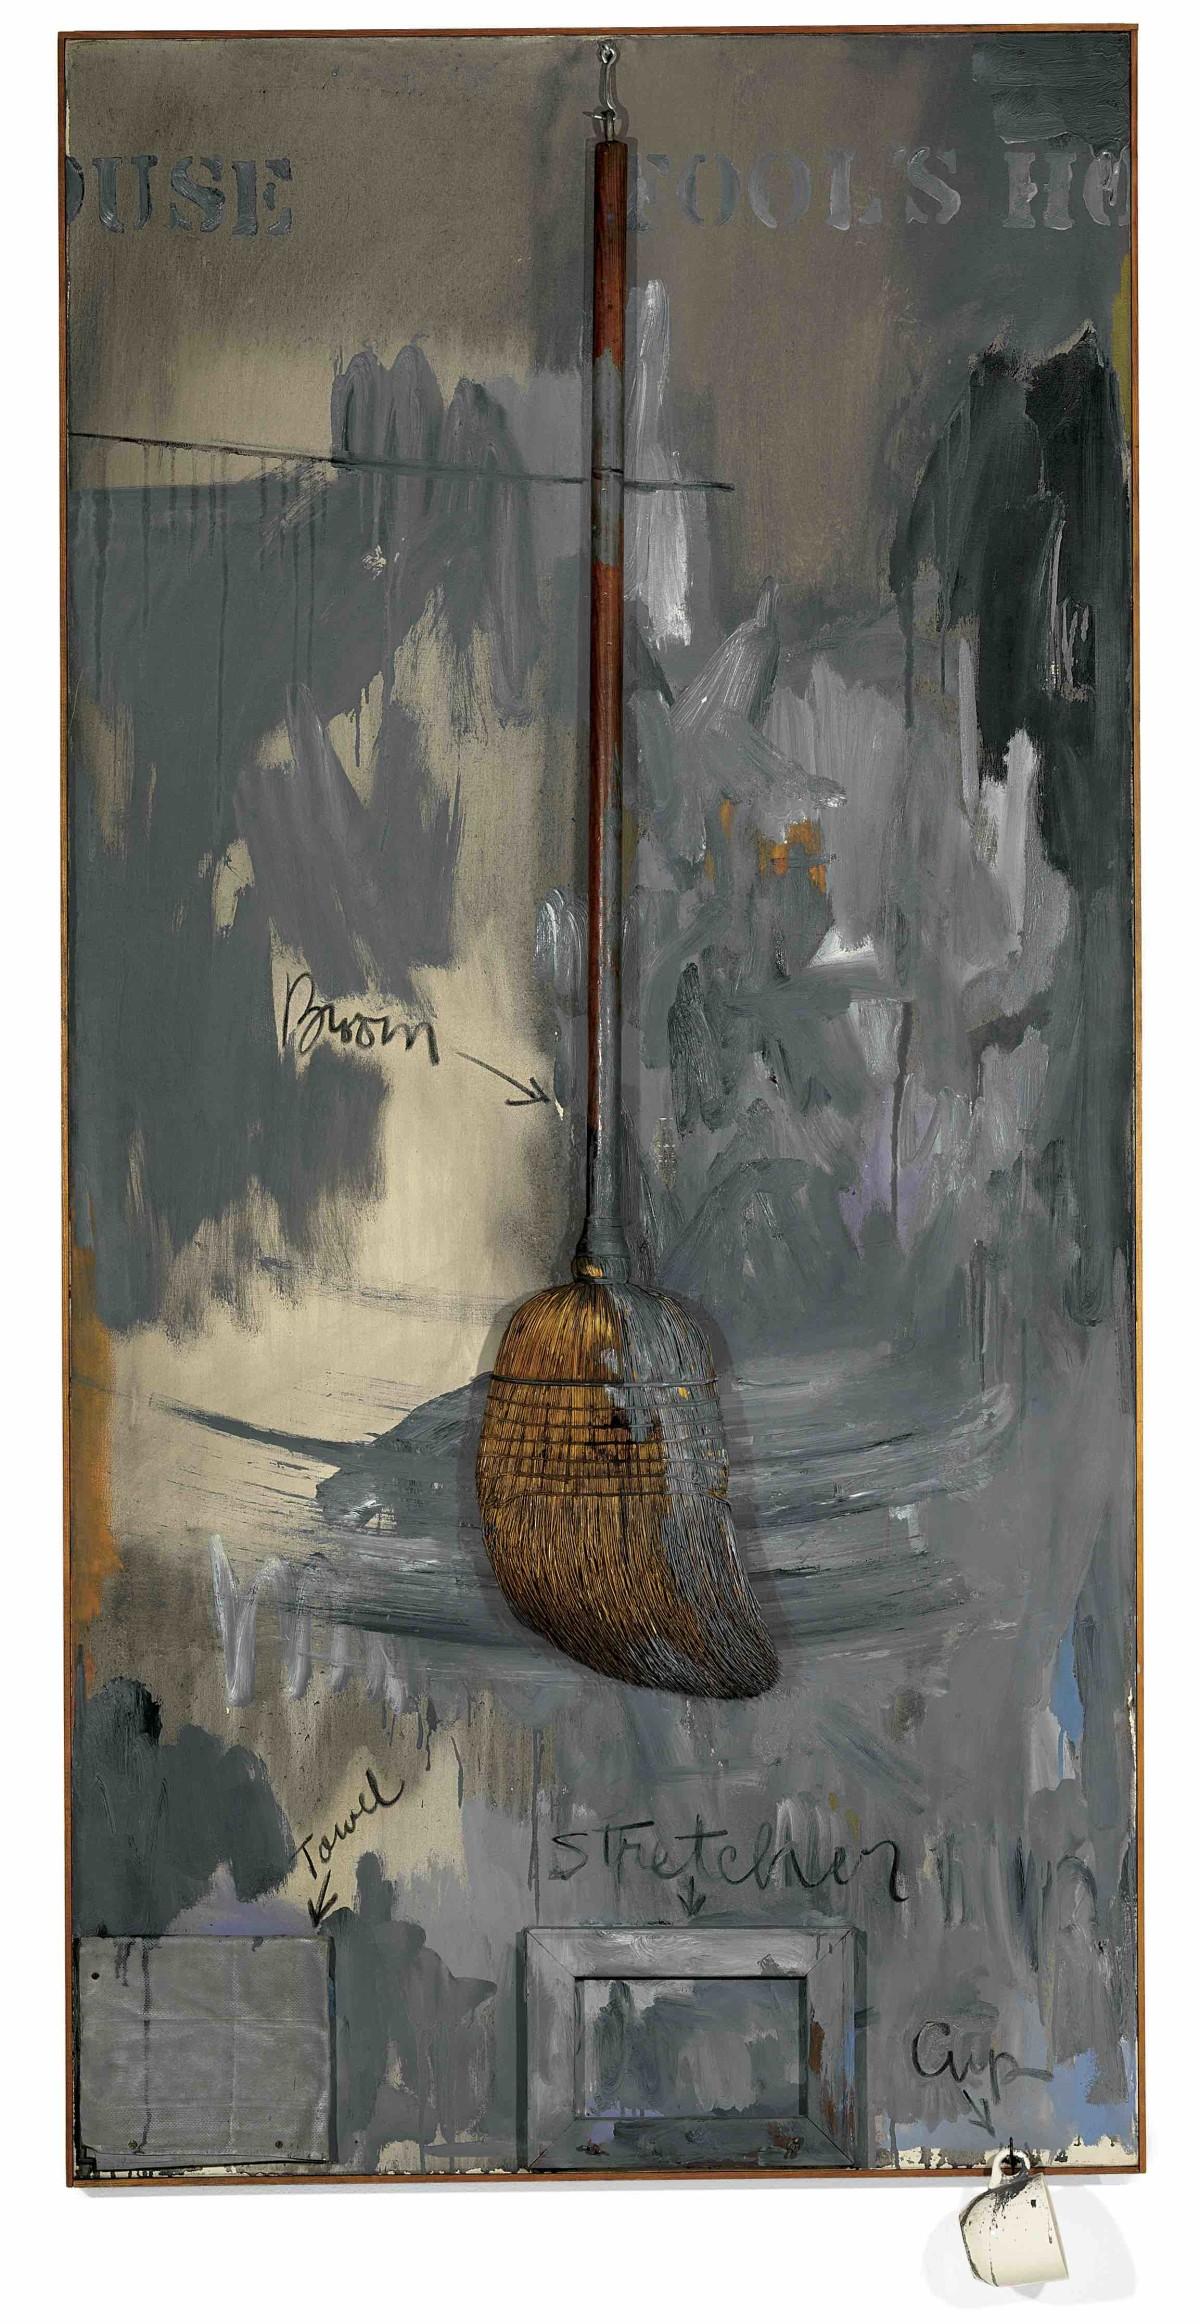 Jasper Johns, Fool's House, 1962